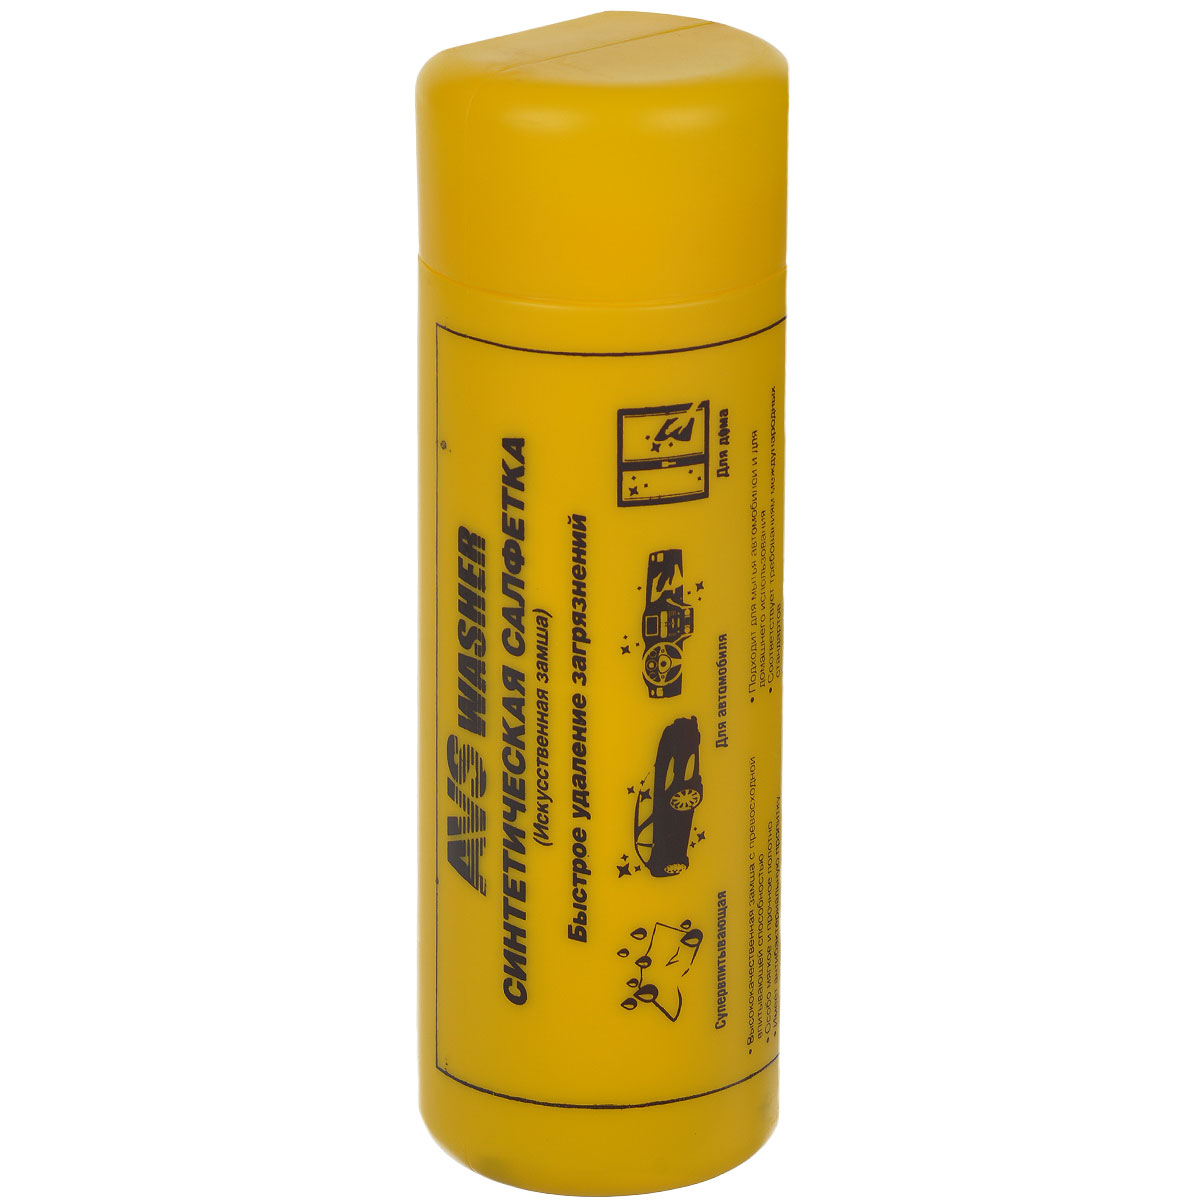 Салфетка синтетическая AVS CH-6443, 64 х 43 см салфетка замша ультра синтетическая ultra chamois ab c 03